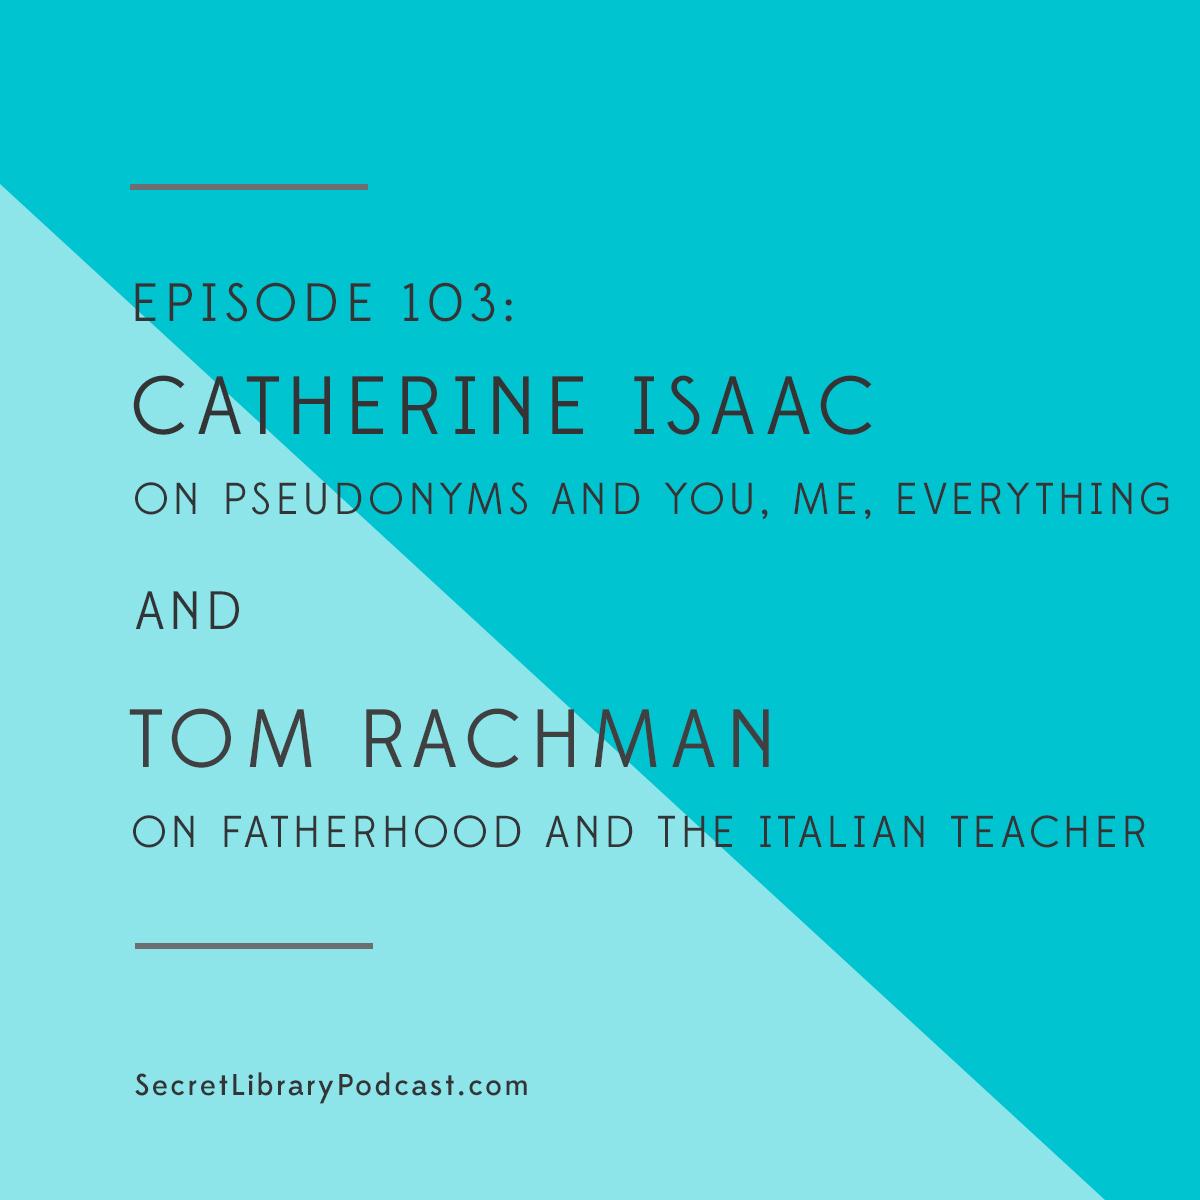 Episode 103 Catherine Isaac + Tom Rachman